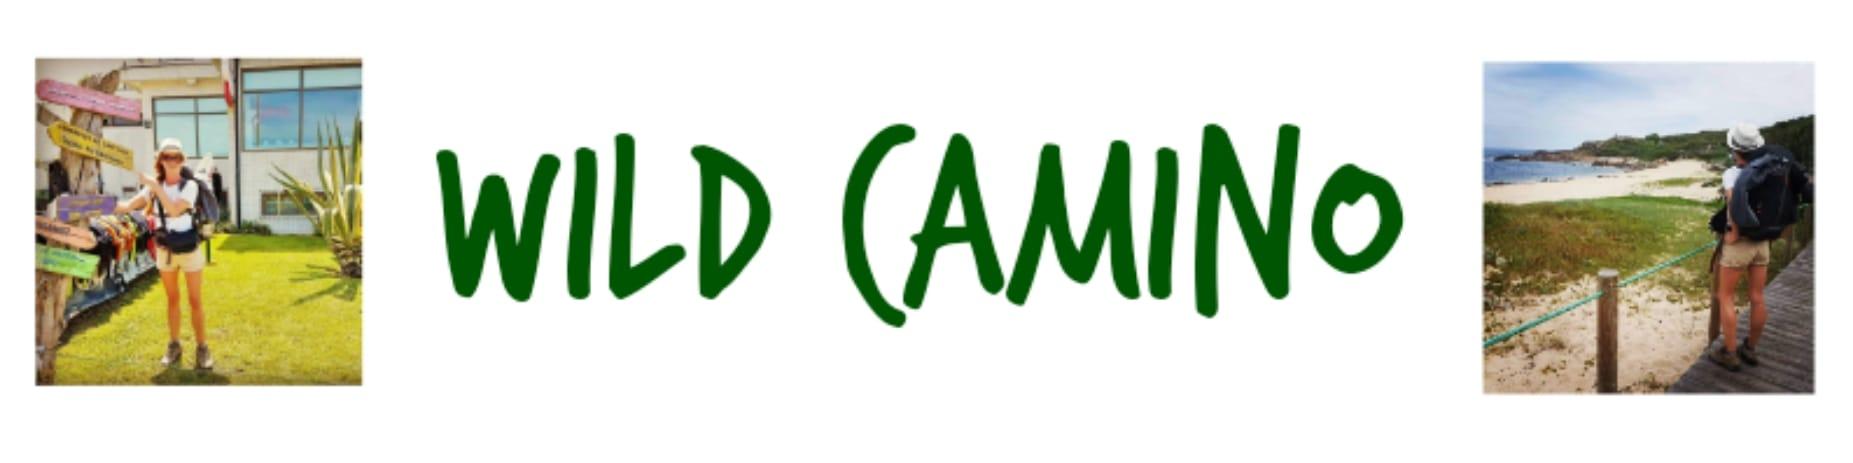 Wild Camino